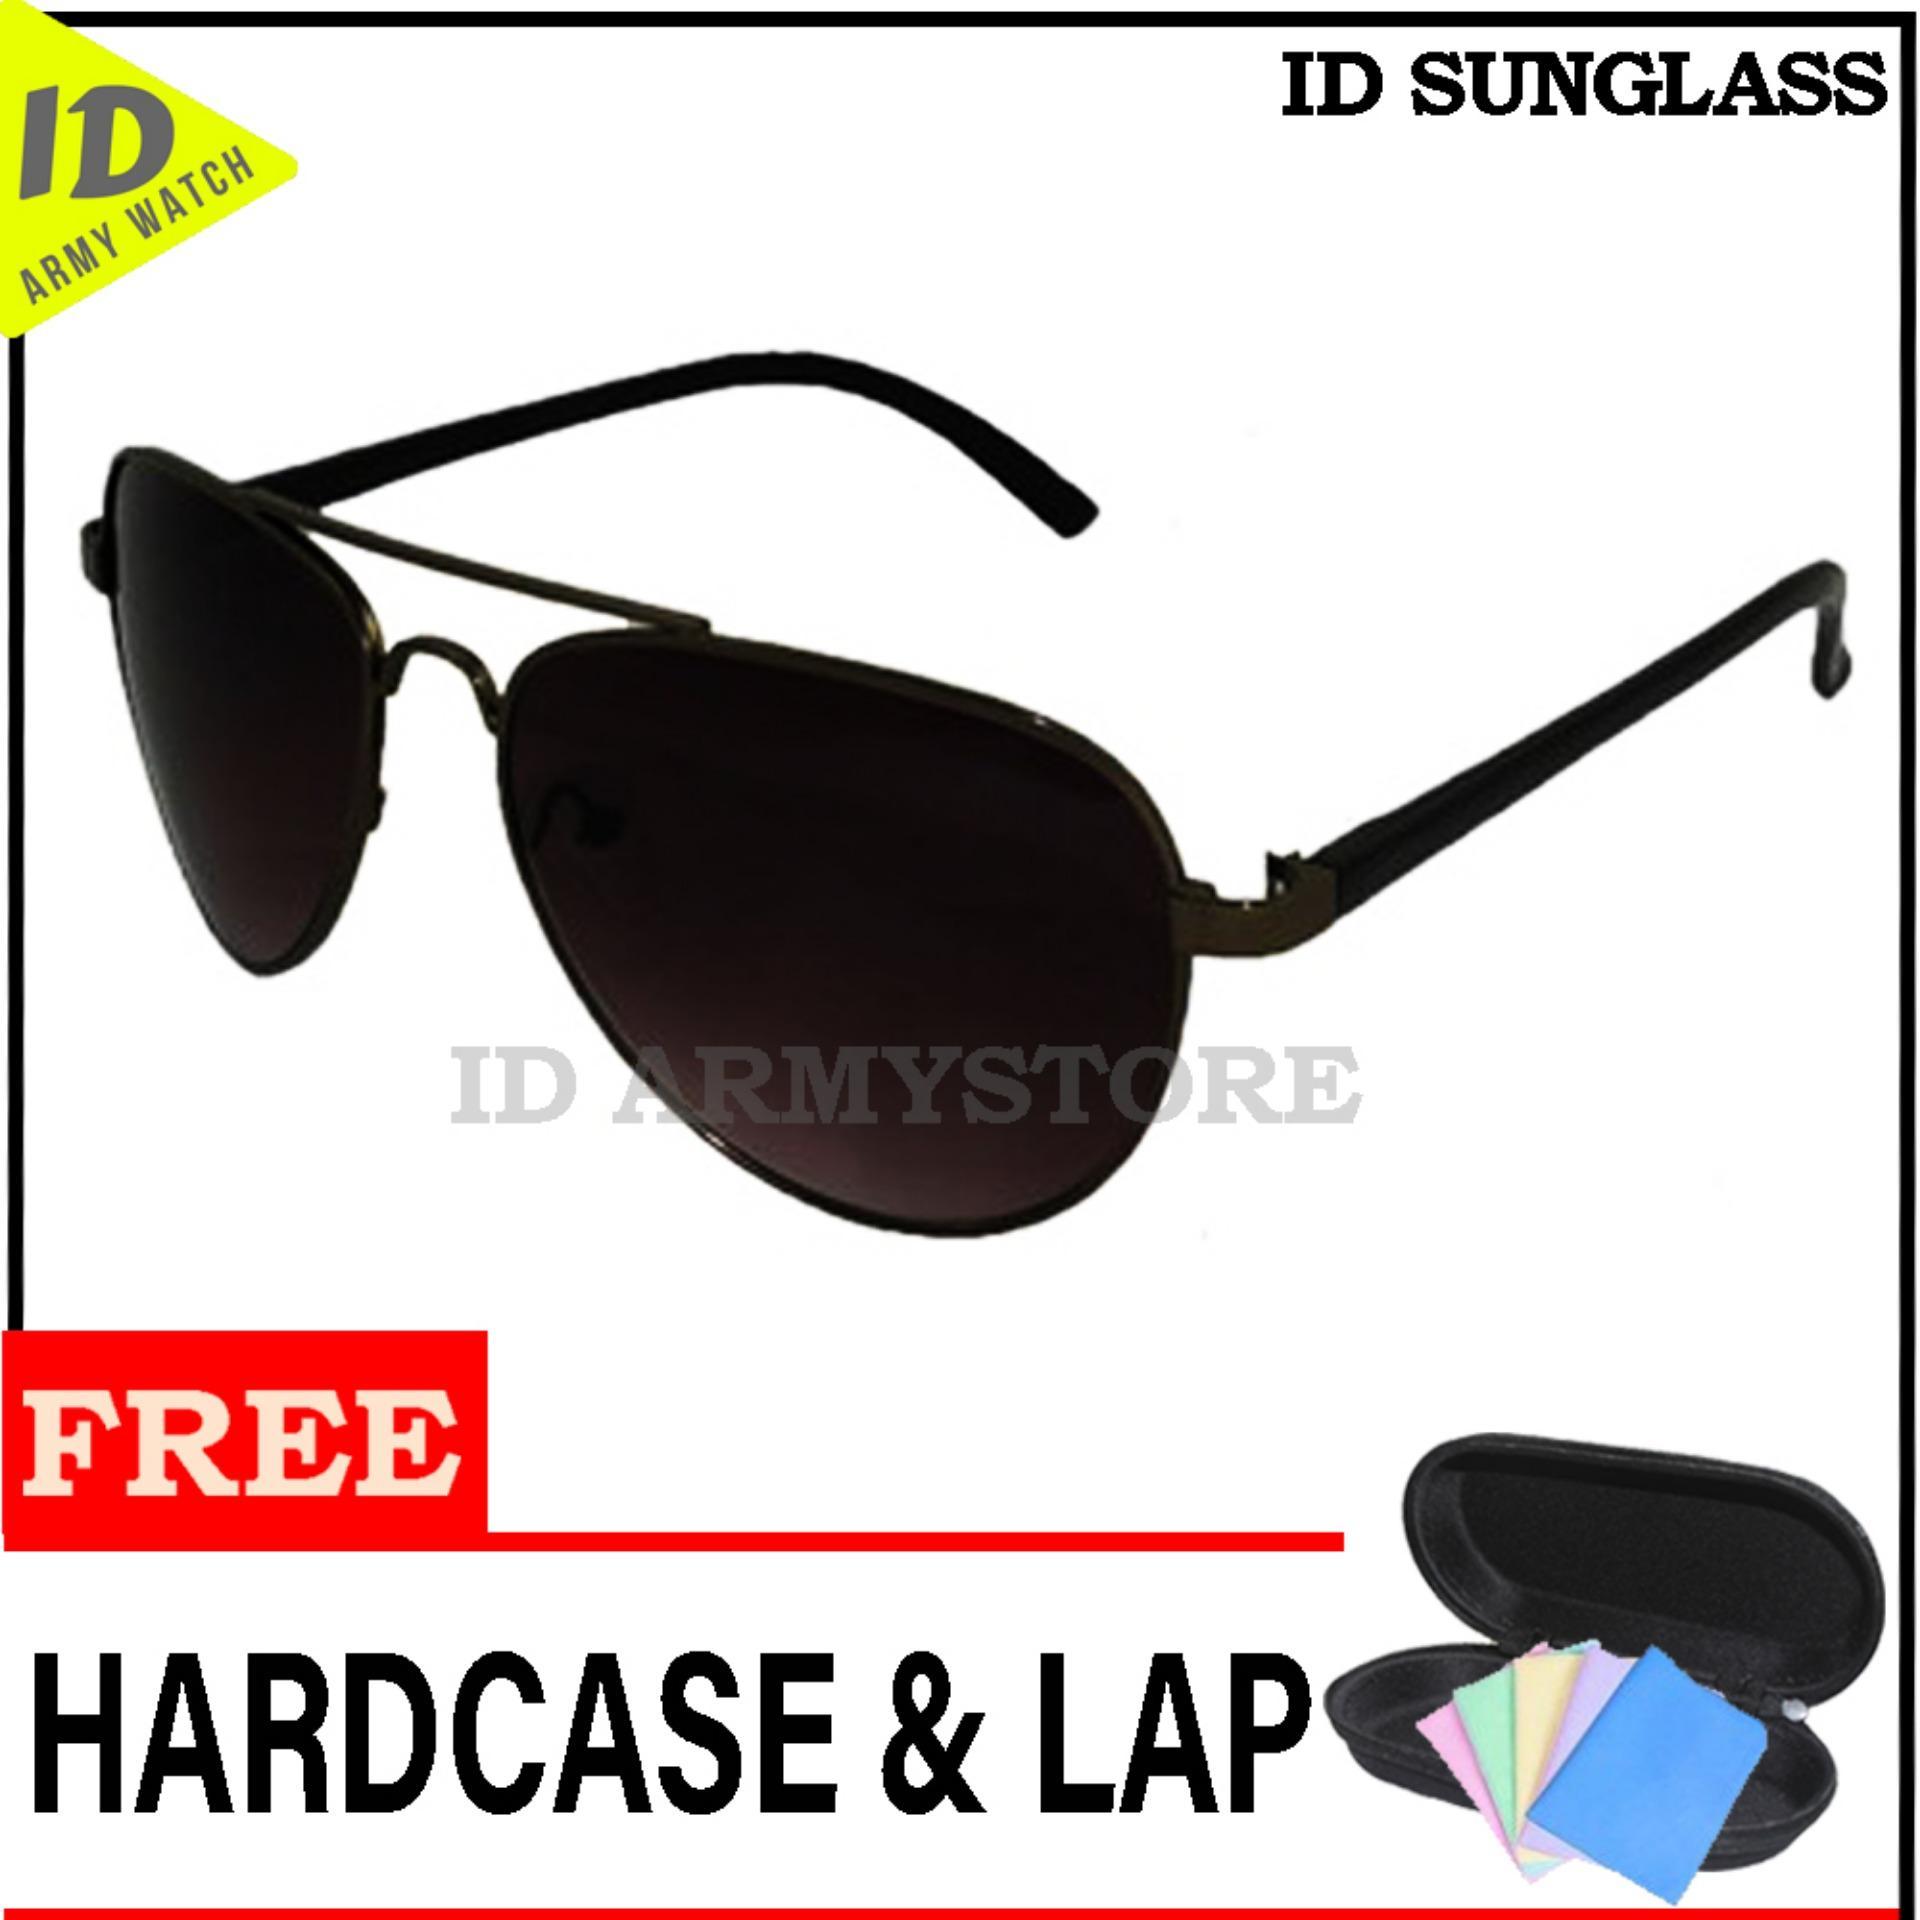 ID Sunglass - Kacamata Aviat Pria Wanita - Frame Hitam - Lensa Coklat SUN  1003- 58b4940c46